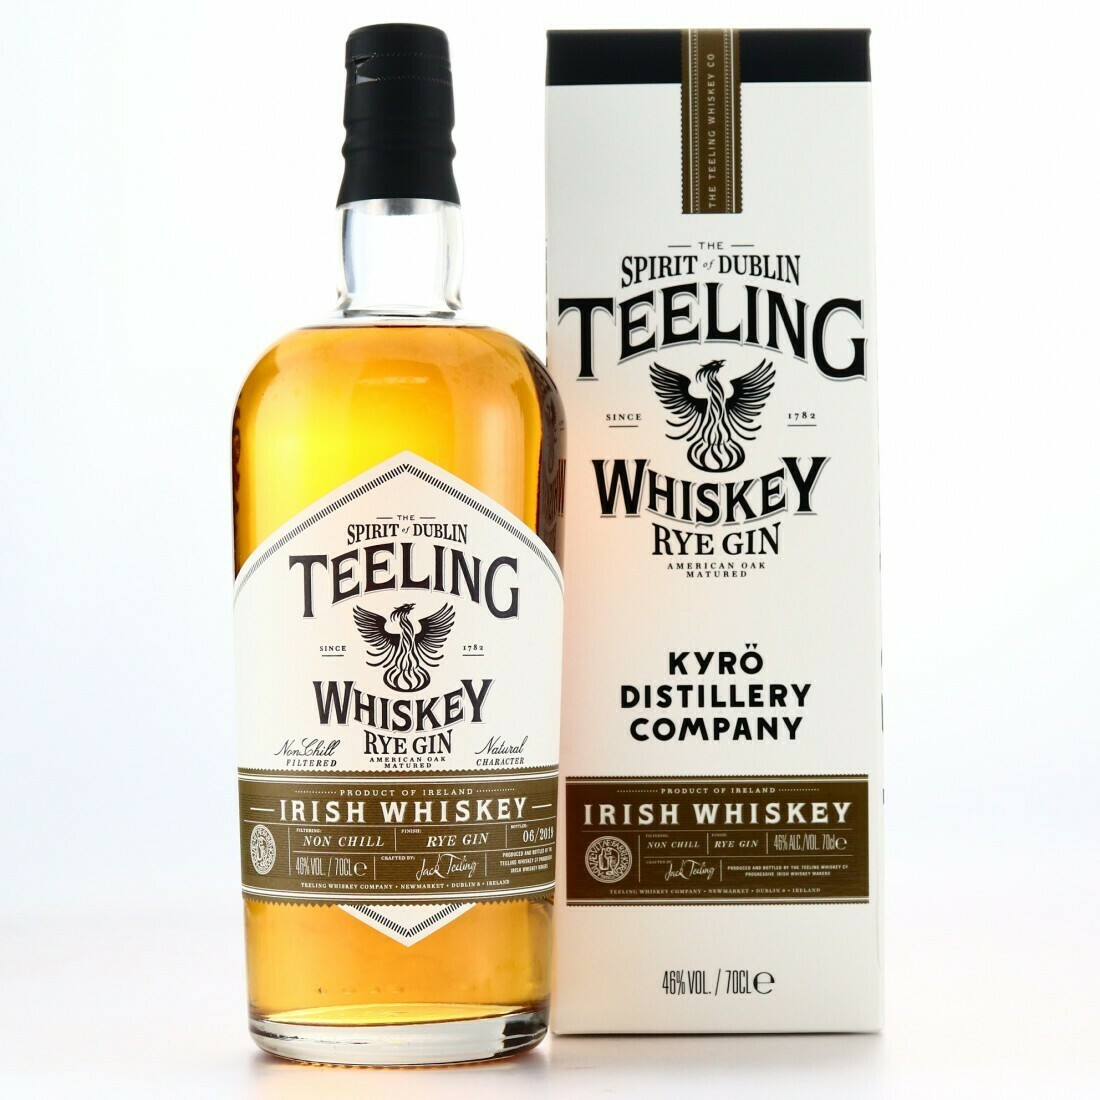 Teeling Rye Gin Finish 46% 70CL